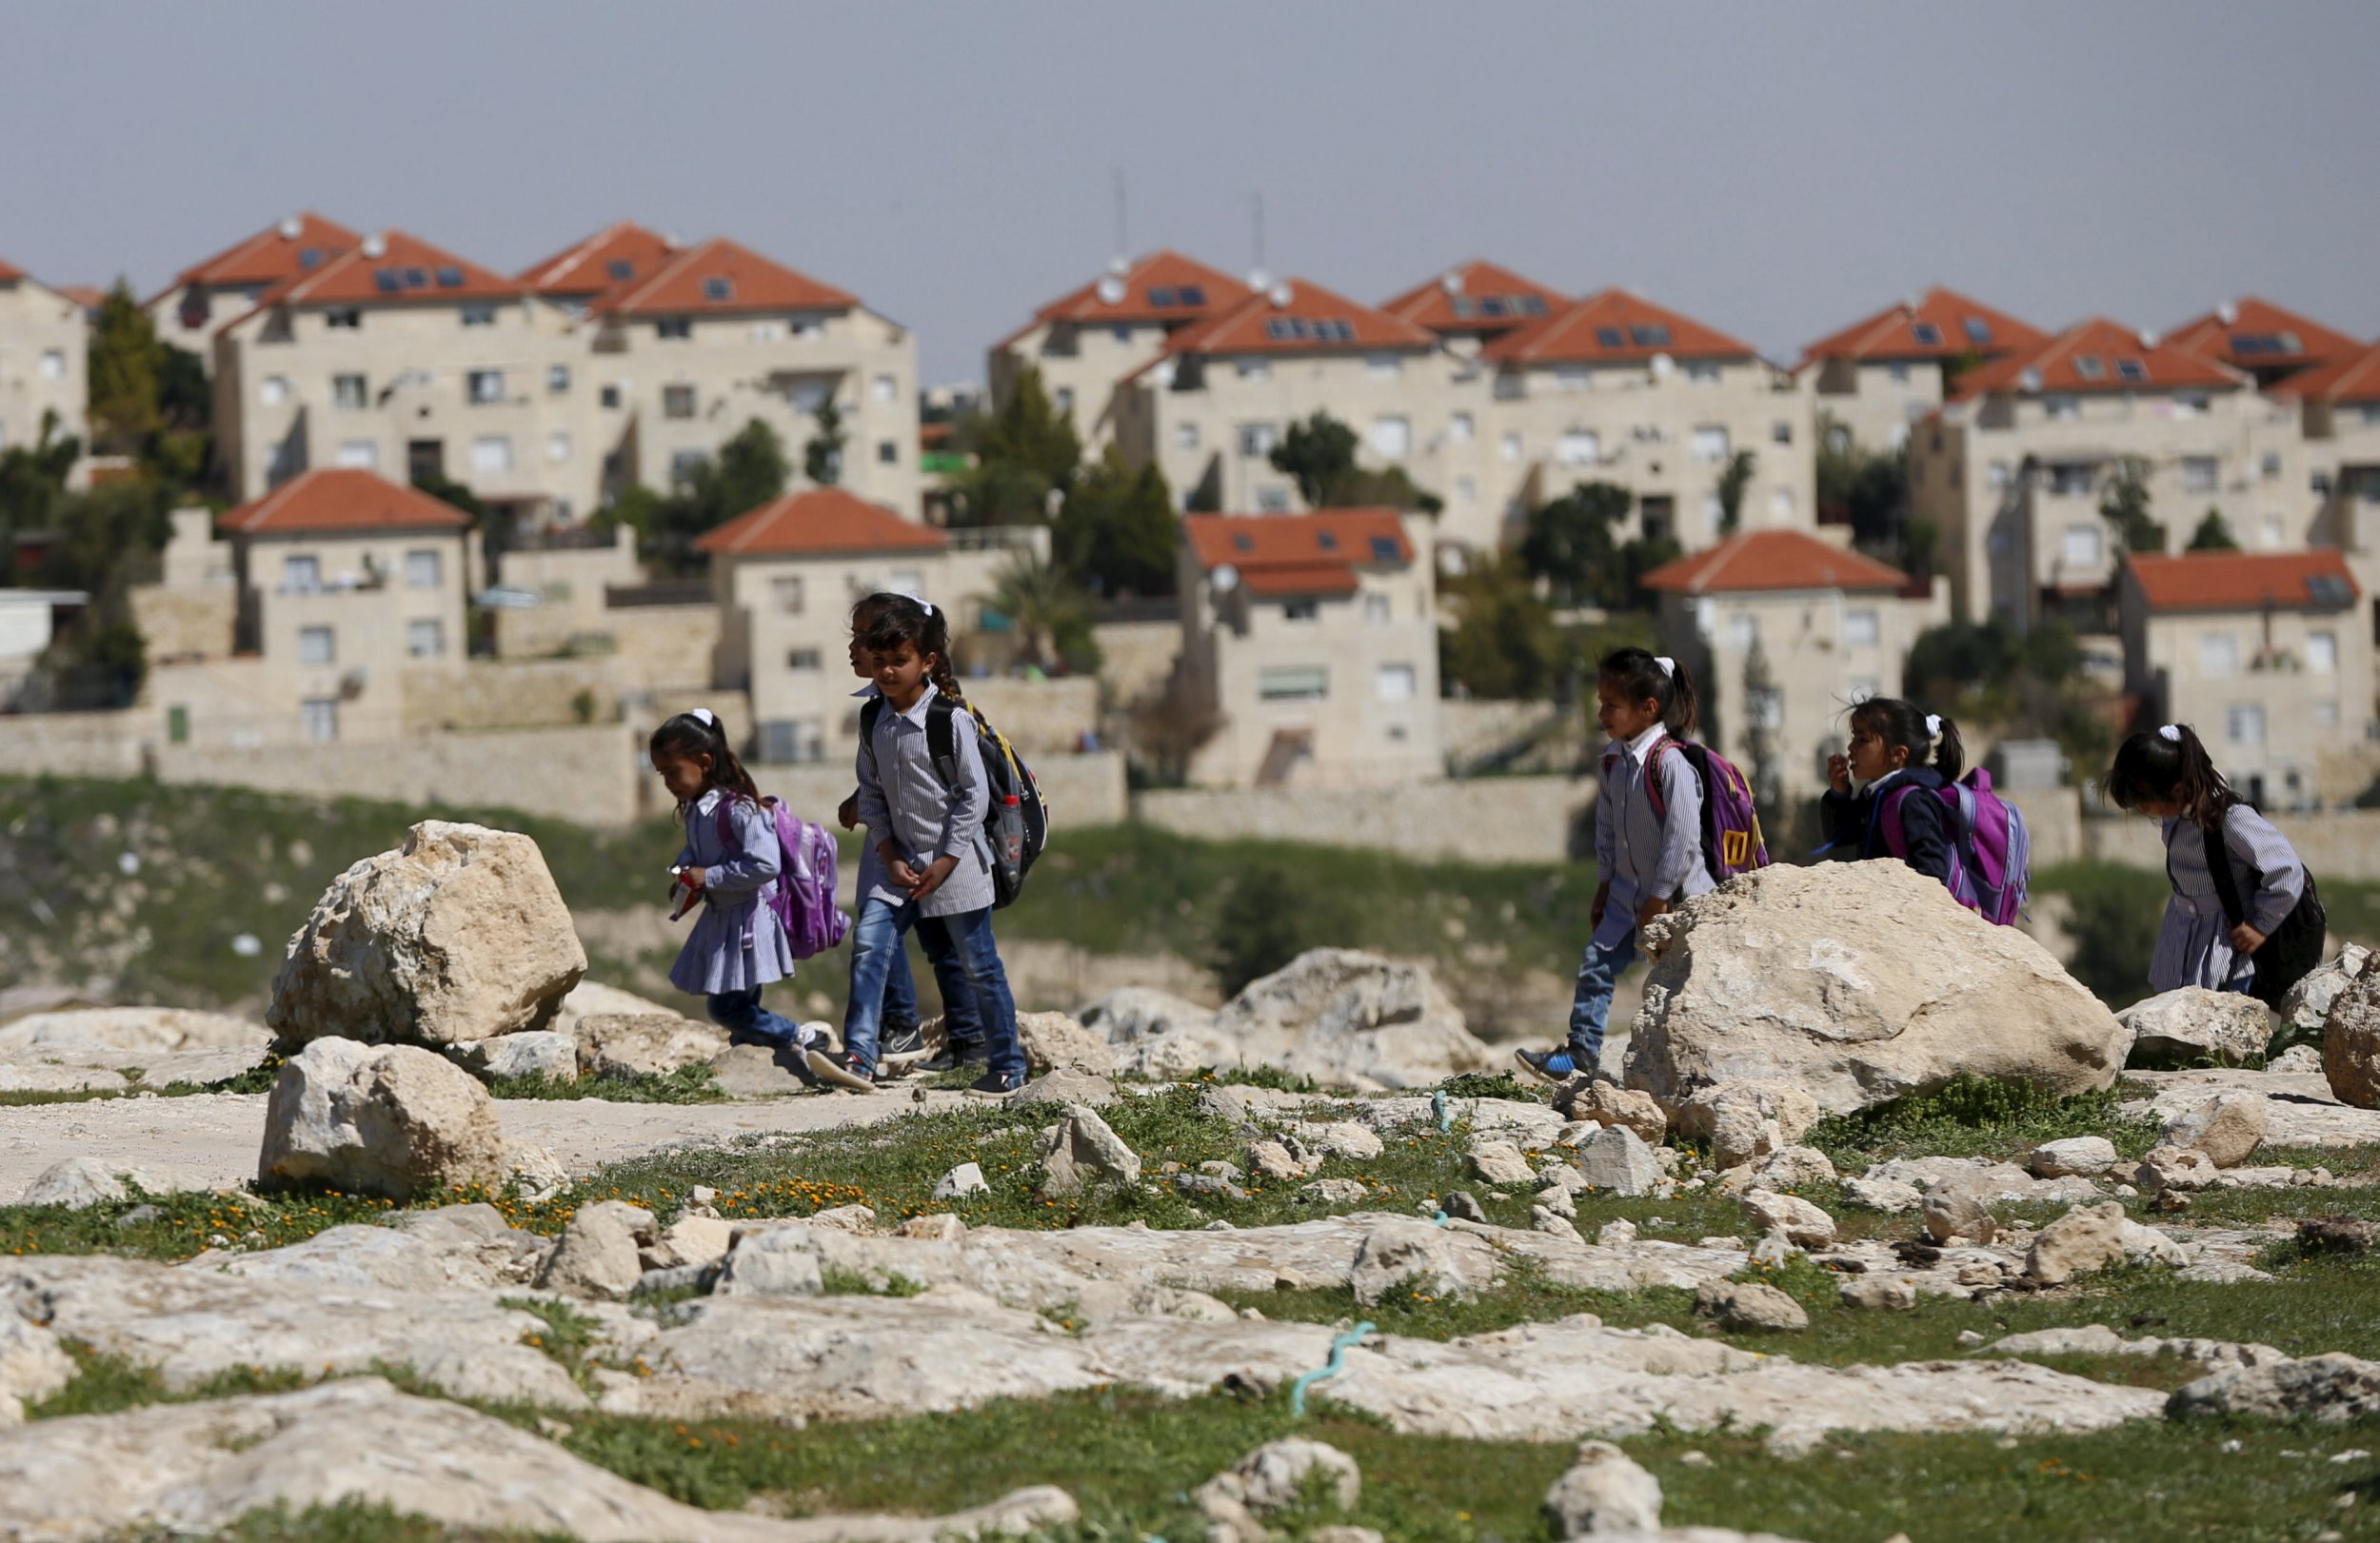 08_07_Israel_Settlement_01